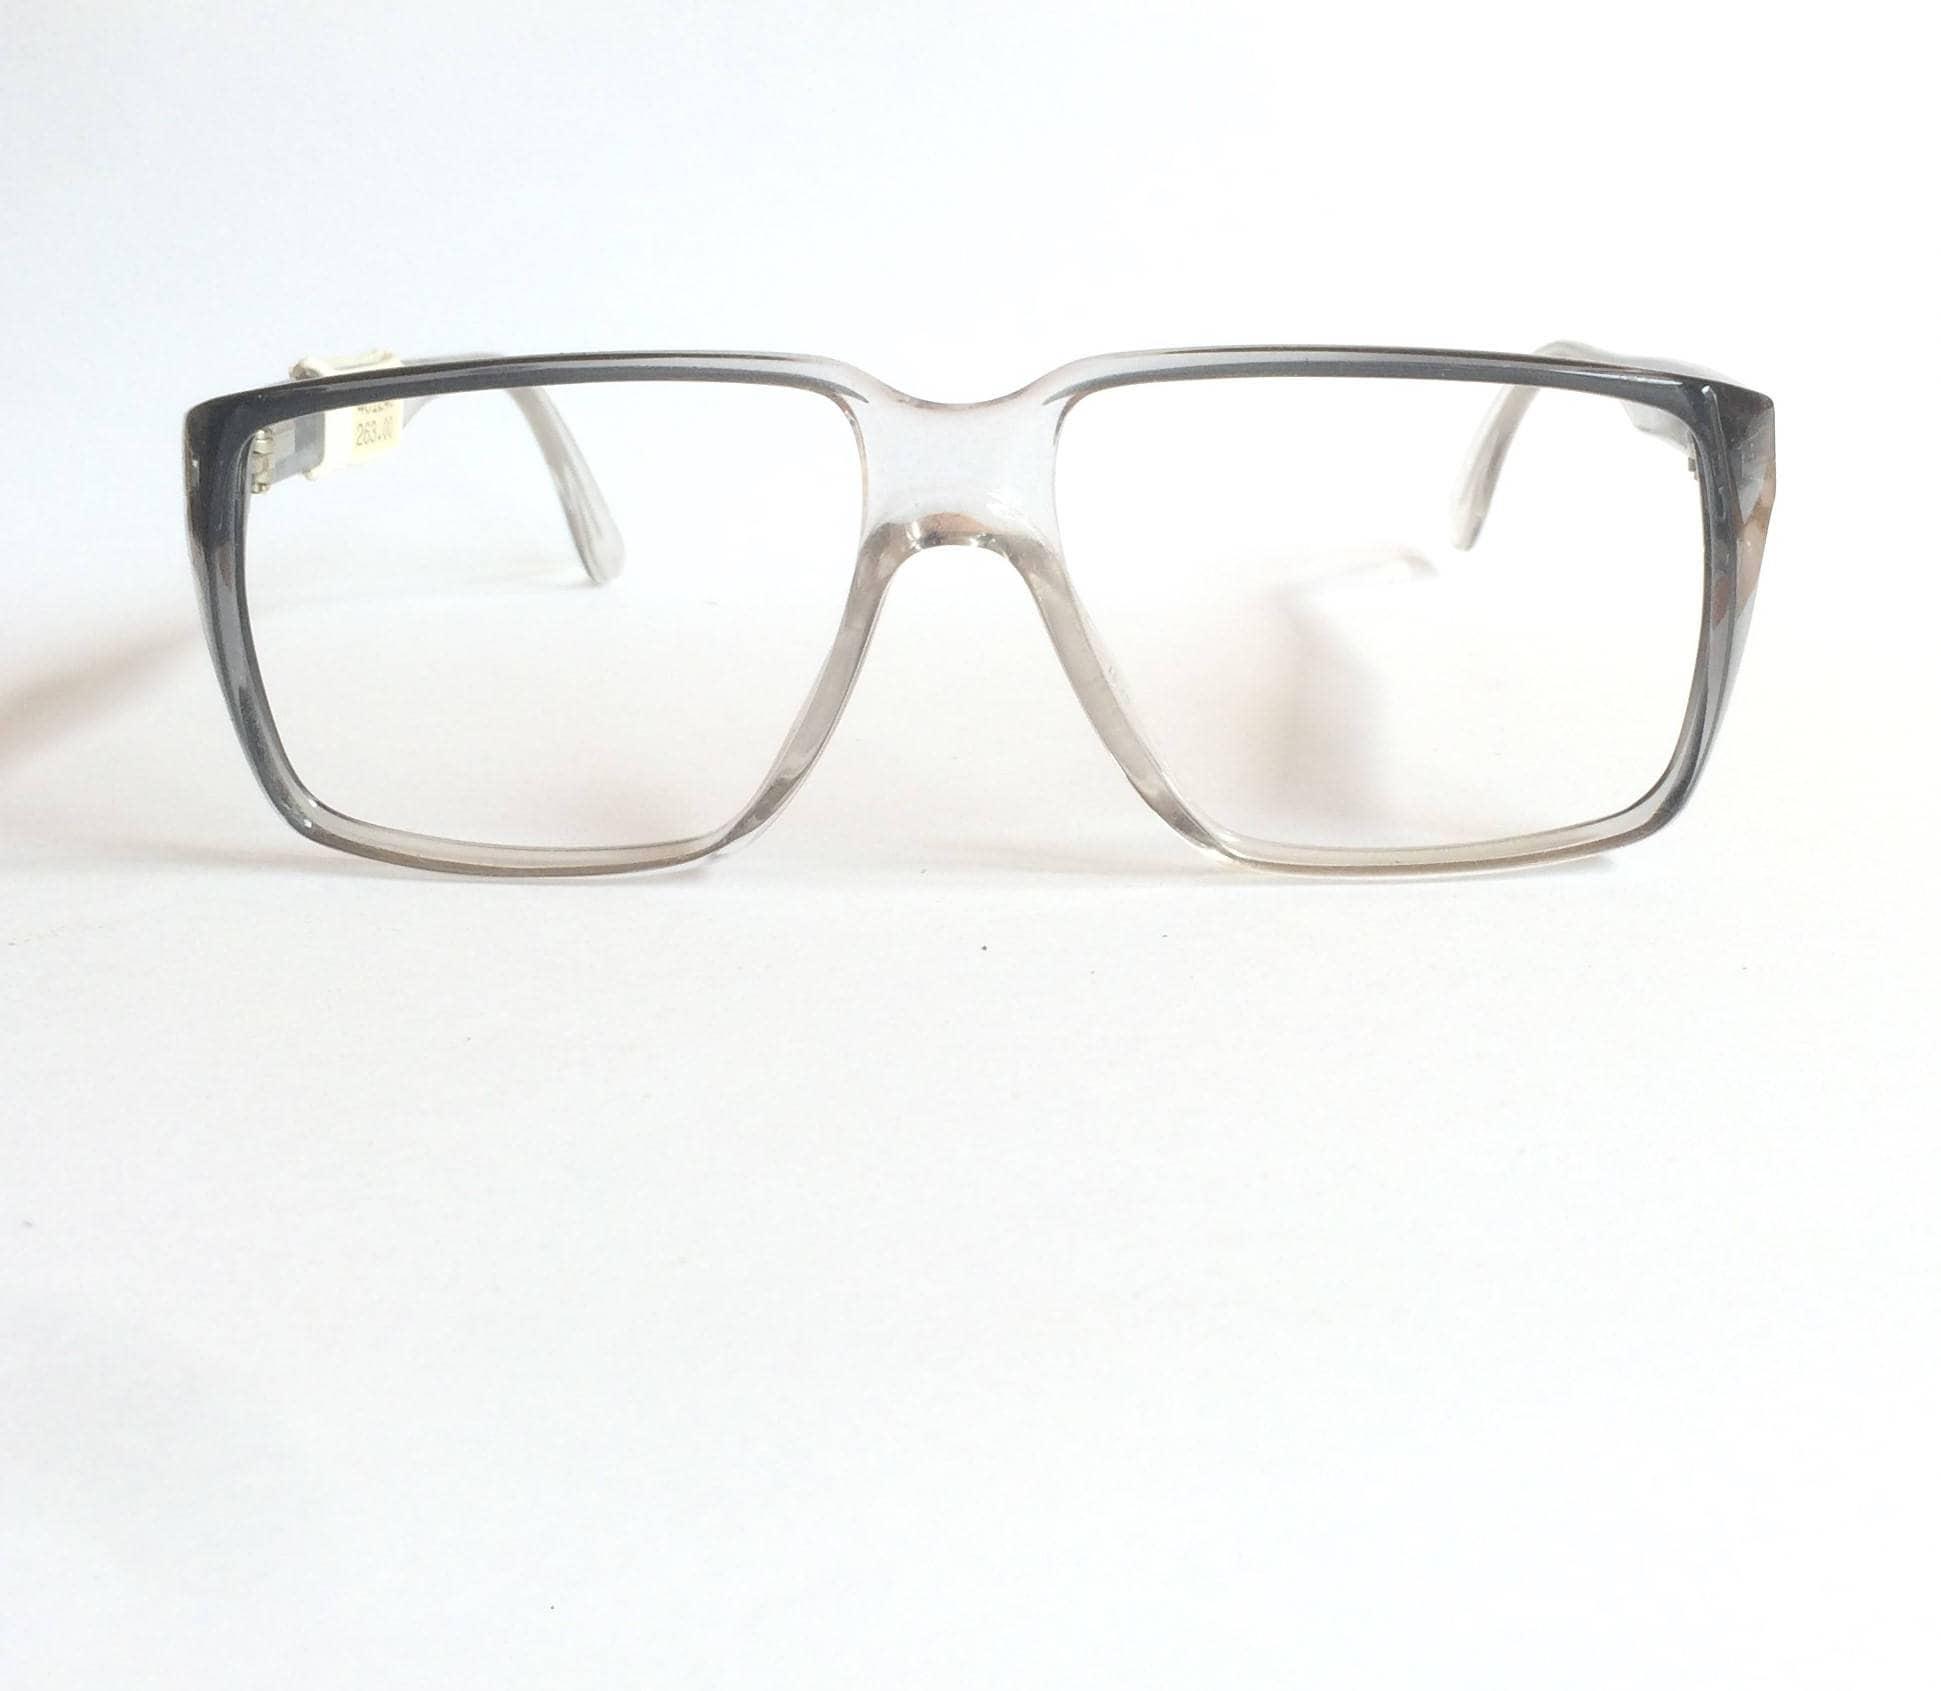 Deadstock vintage Rodenstock Exclusiv 365 Flat Top Glasses Grey ...